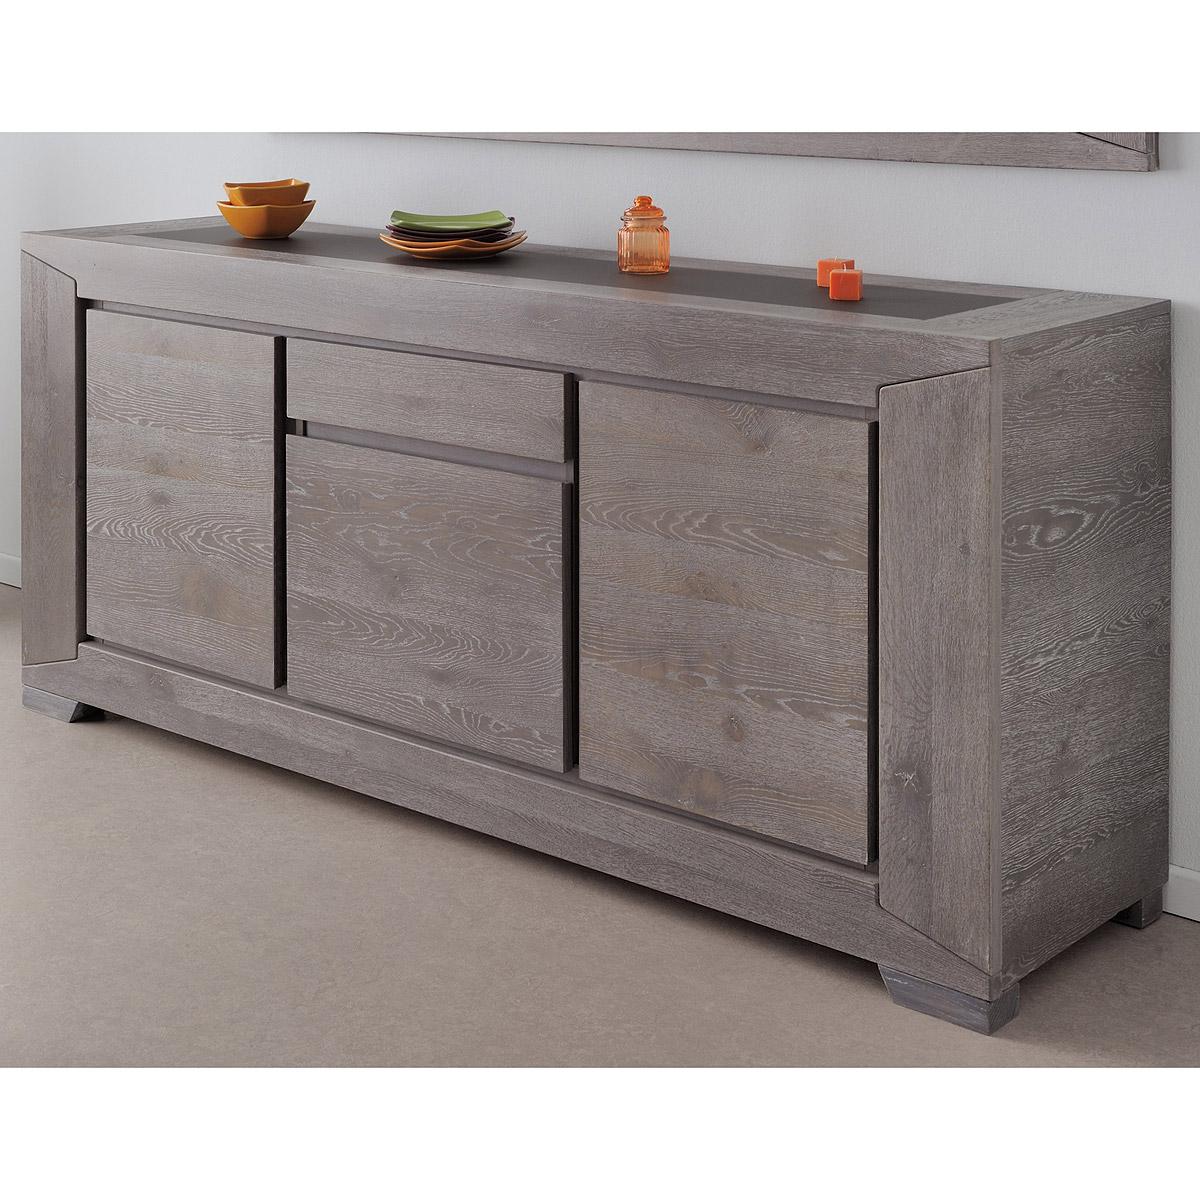 sideboard titan kommode anrichte in eiche grau teilmassiv 195 cm ebay. Black Bedroom Furniture Sets. Home Design Ideas